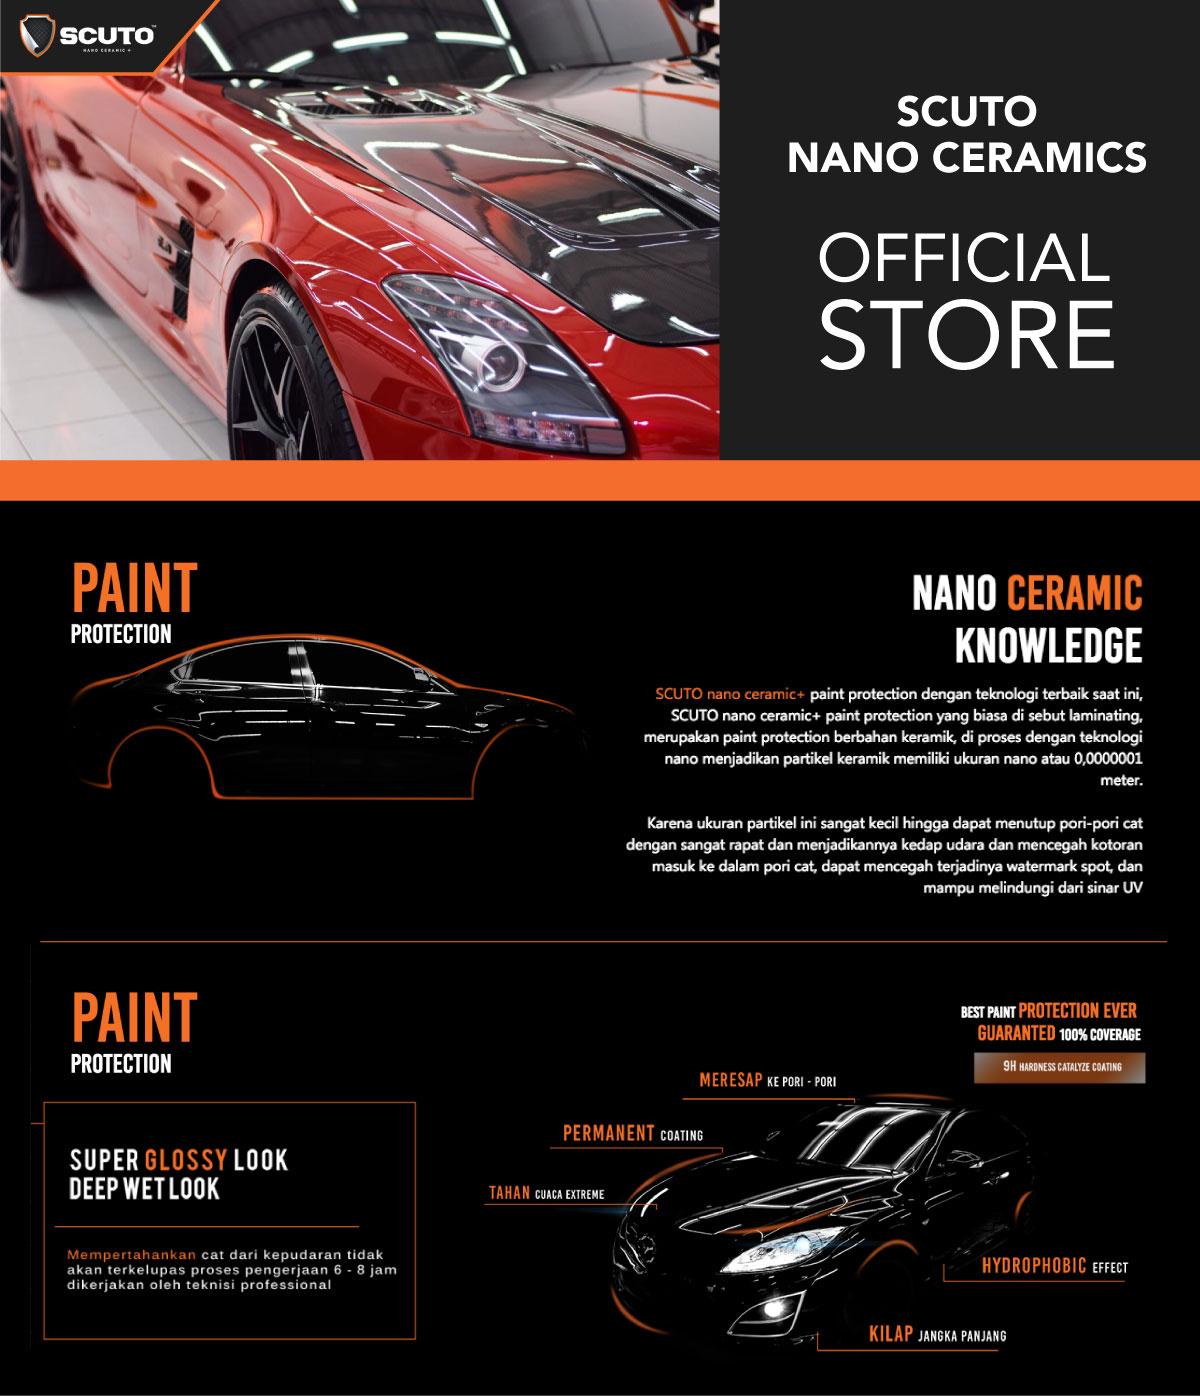 Car Paint Store >> Official Store Produk Otomotif Resmi Scuto Indonesia